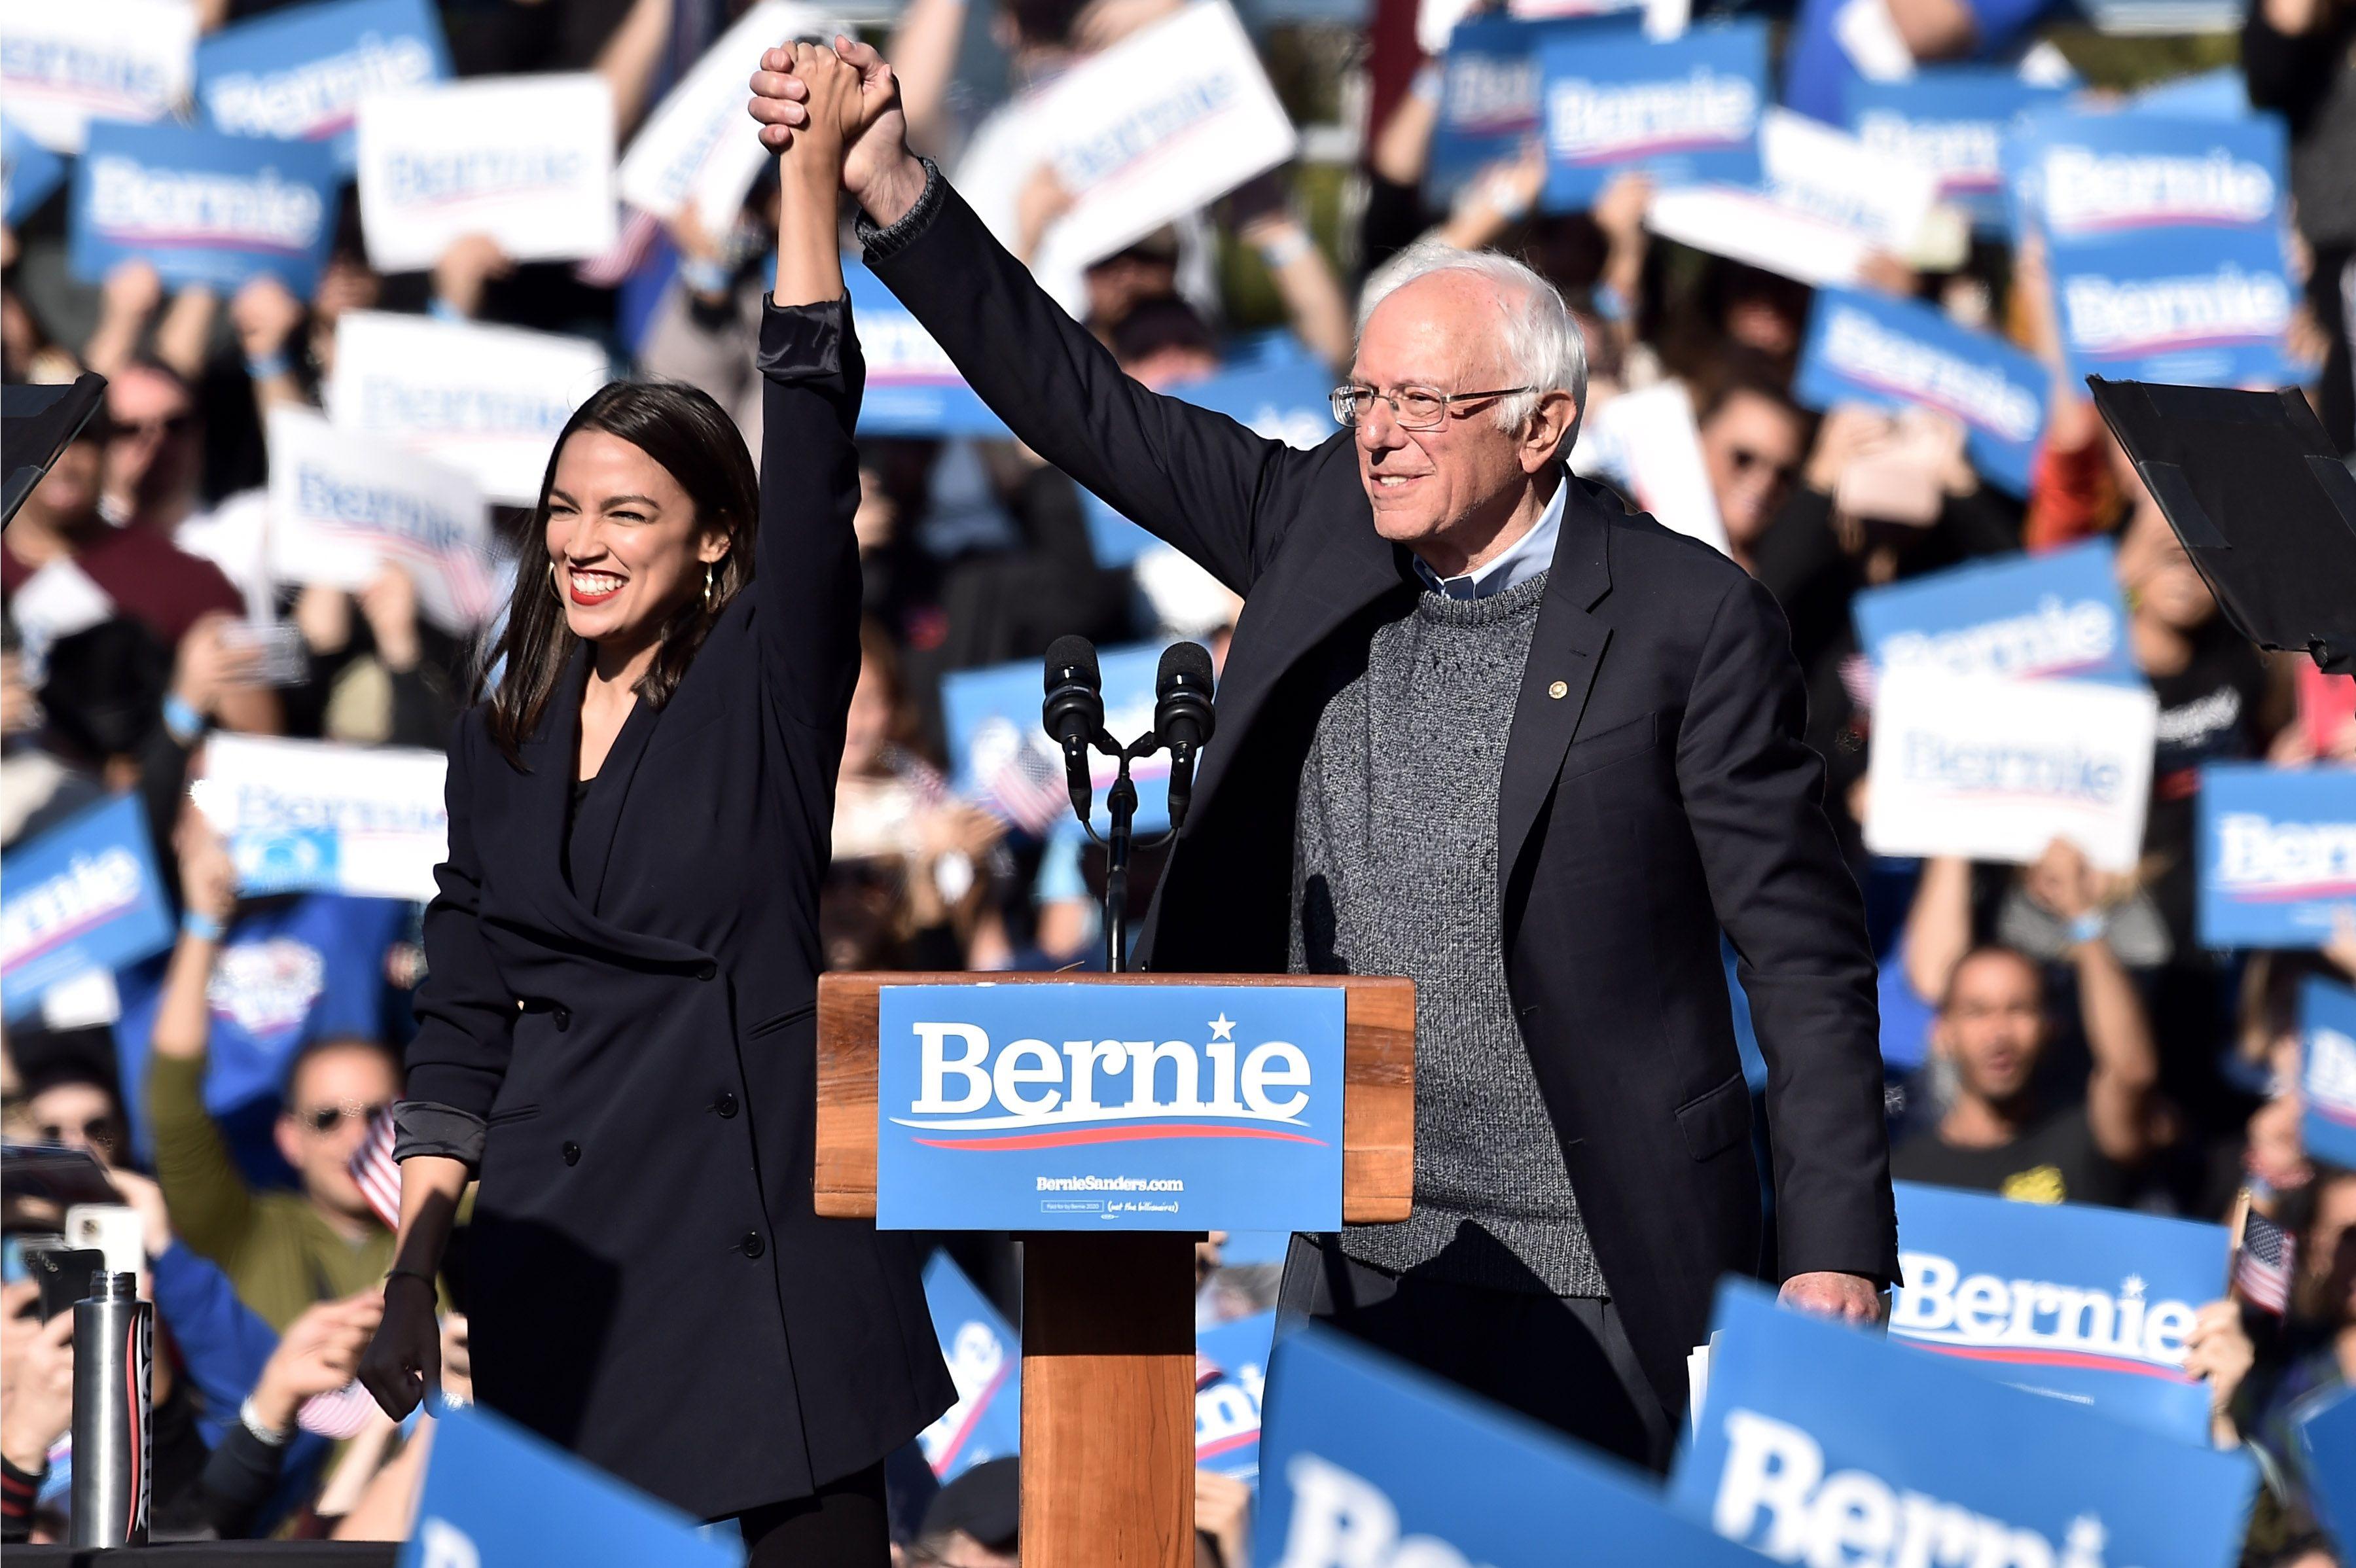 Alexandria Ocasio-Cortez Endorses Bernie Sanders at Rally